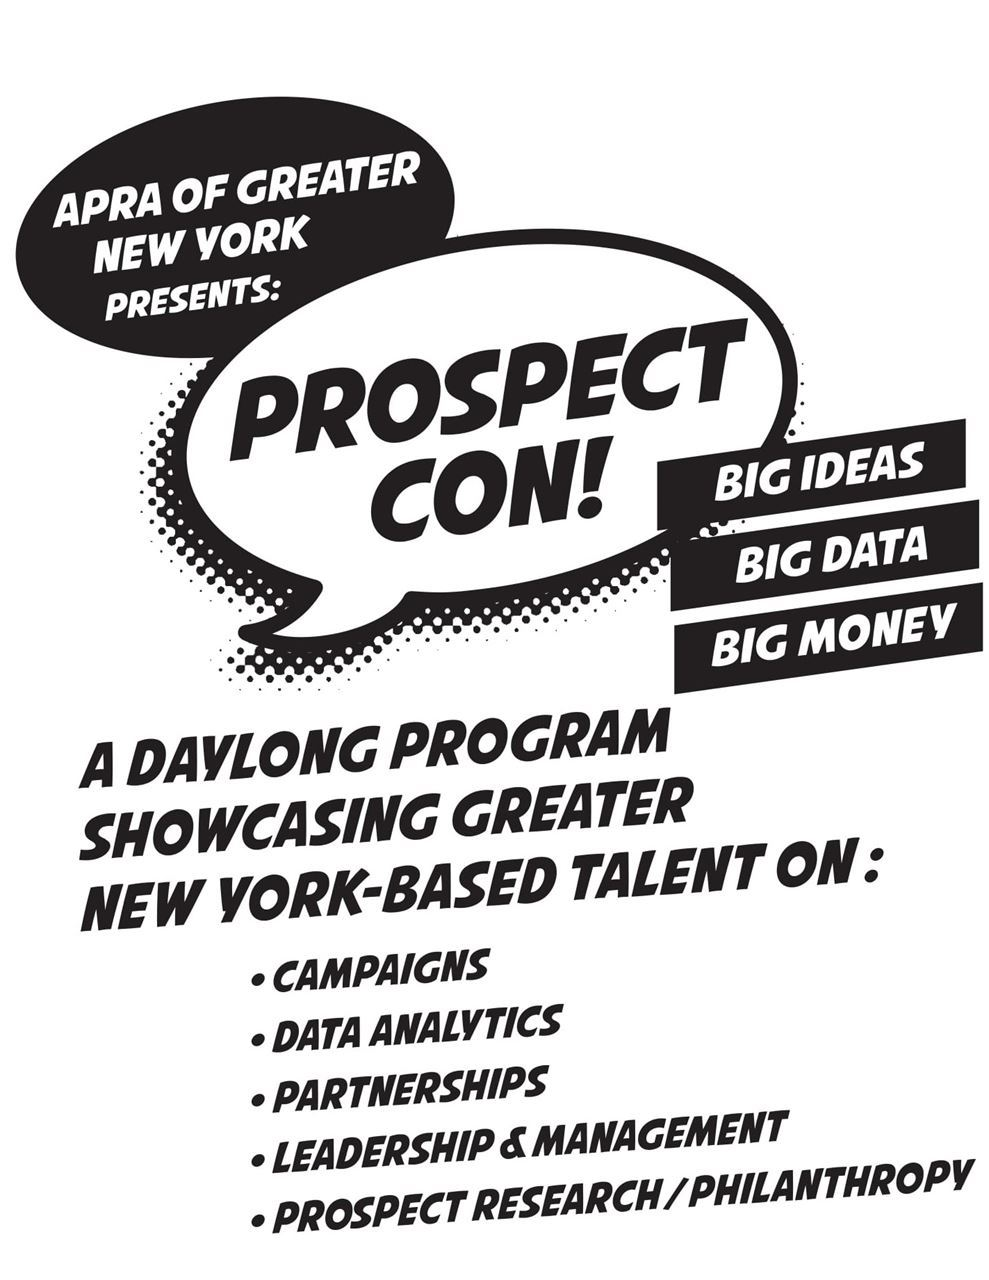 Apra Of Greater New York Prospectcon 2018